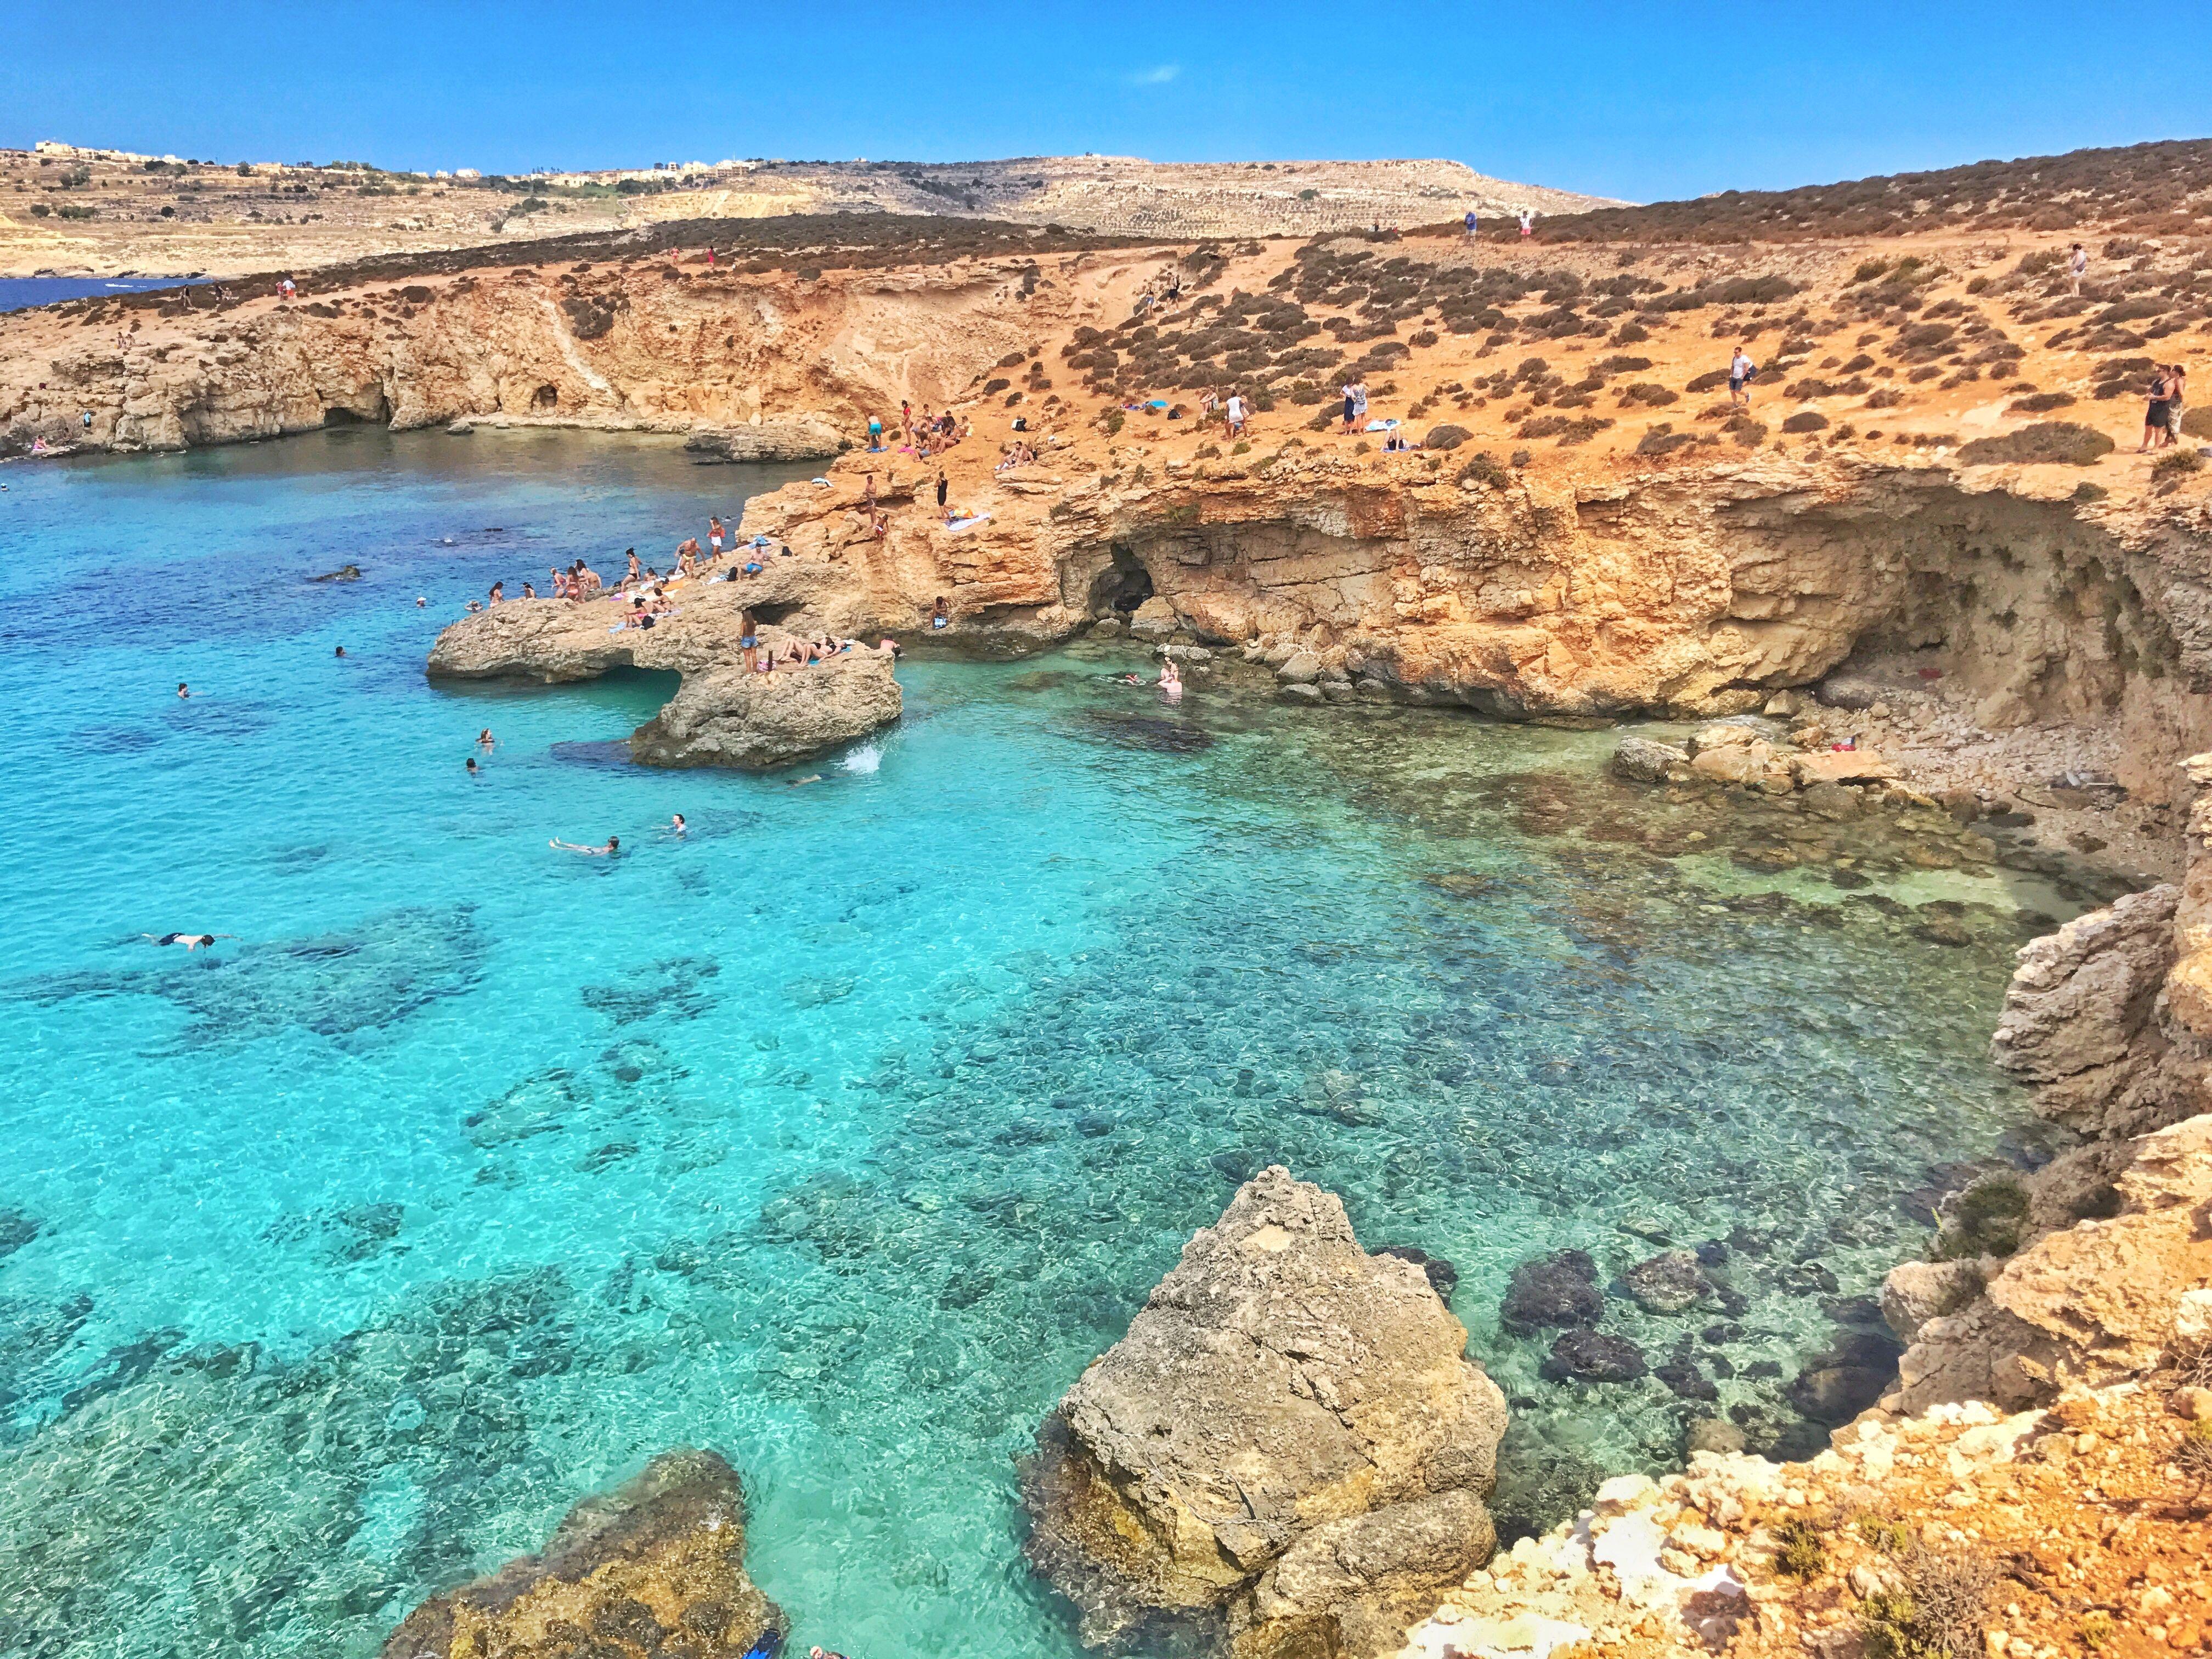 20190403 155549 181 Tourism Malta Tour Malta Island Mei Informatiounen Zu Eisem Site Islands Placestovisit مالطا Maltha Malta Island Malta Tourism